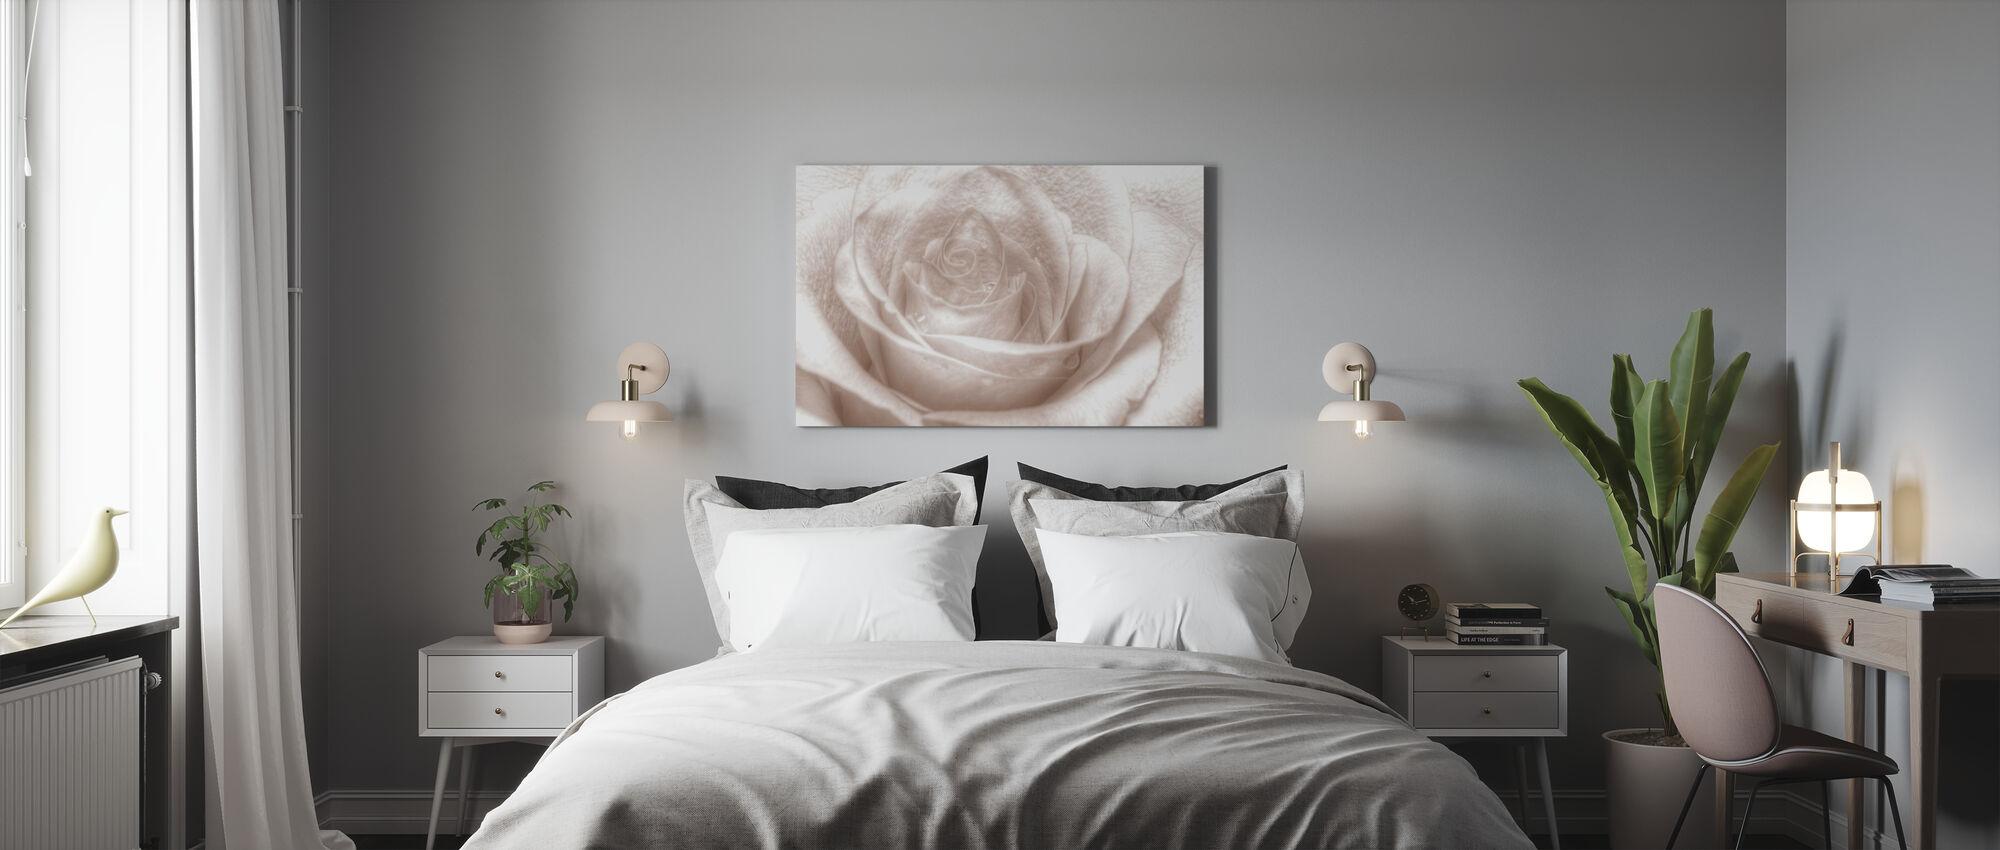 Hoge Sleutel Rose - Canvas print - Slaapkamer